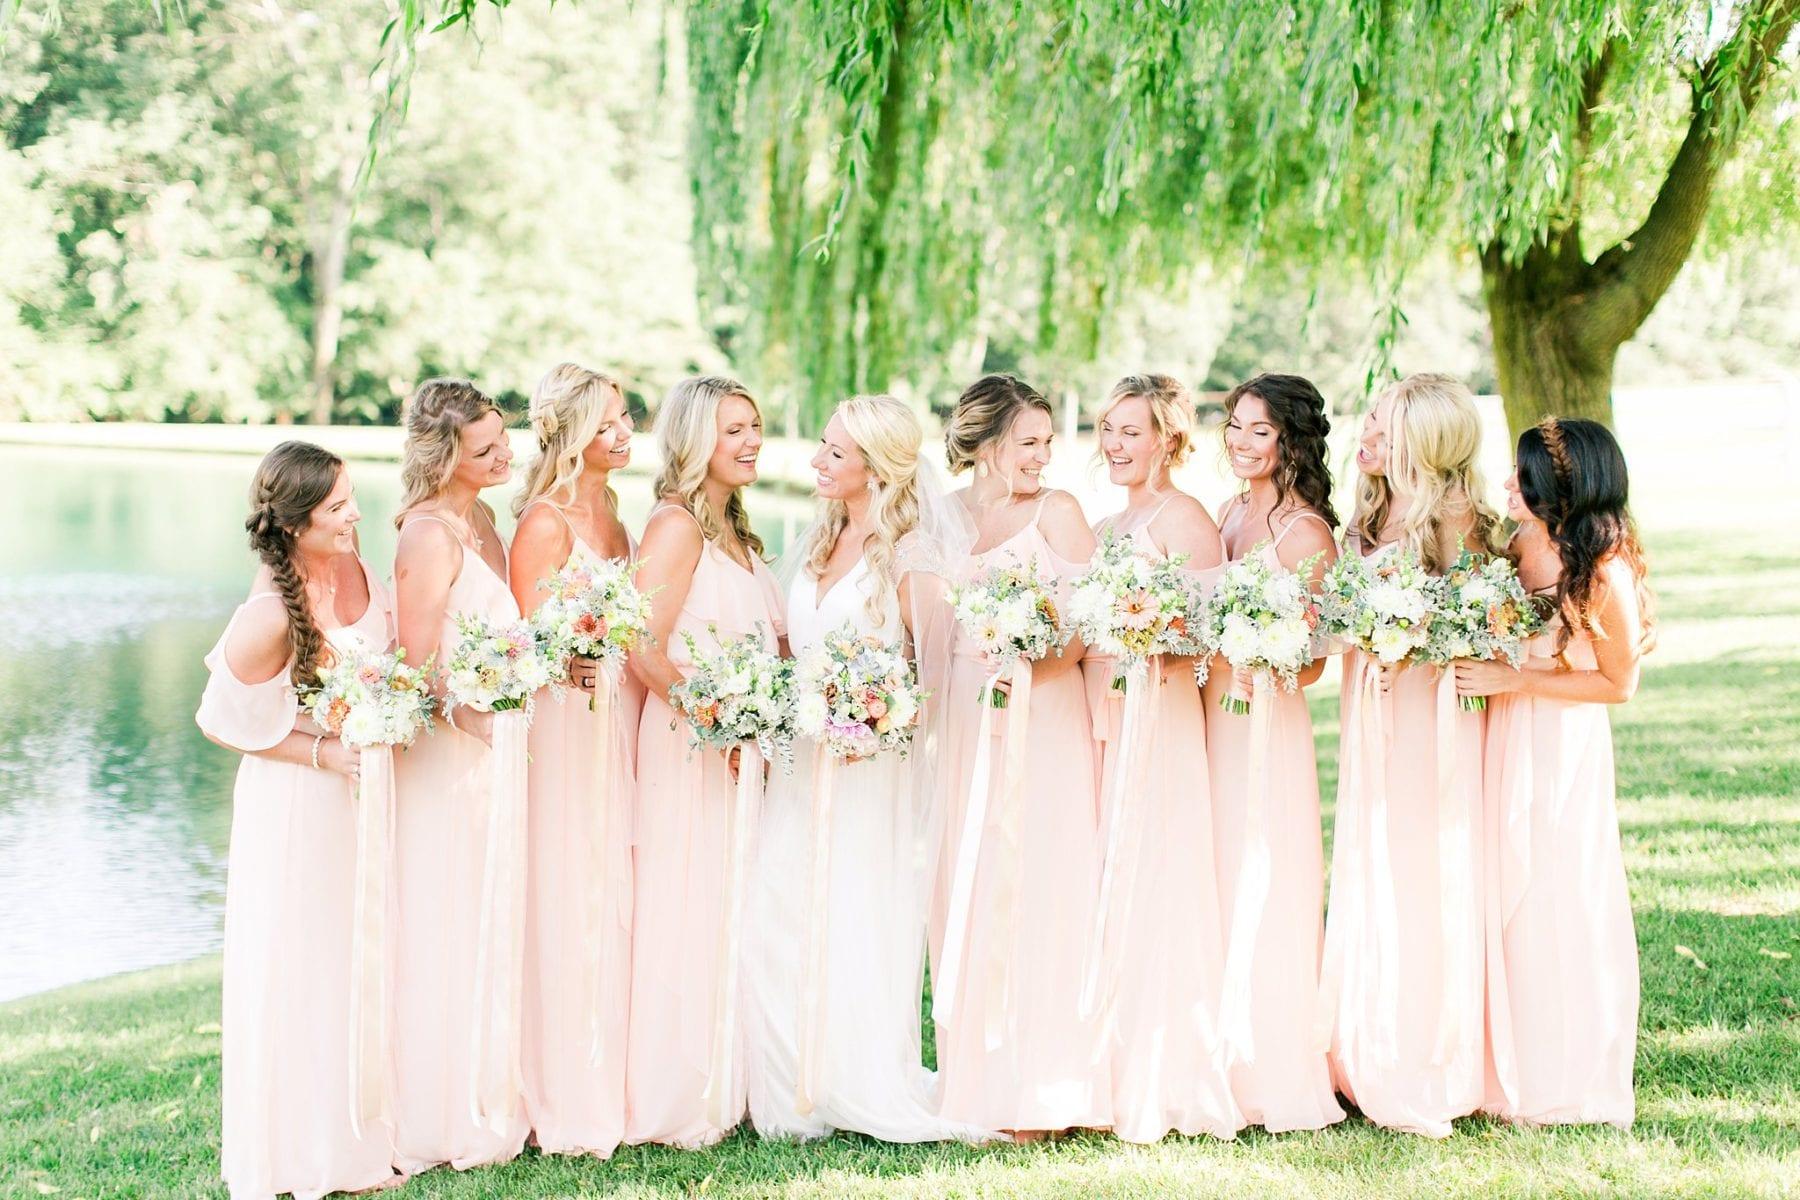 Pond View Farm Wedding Photos Maryland Wedding Photographer Kristen & Ryan Megan Kelsey Photography Blog-143.jpg